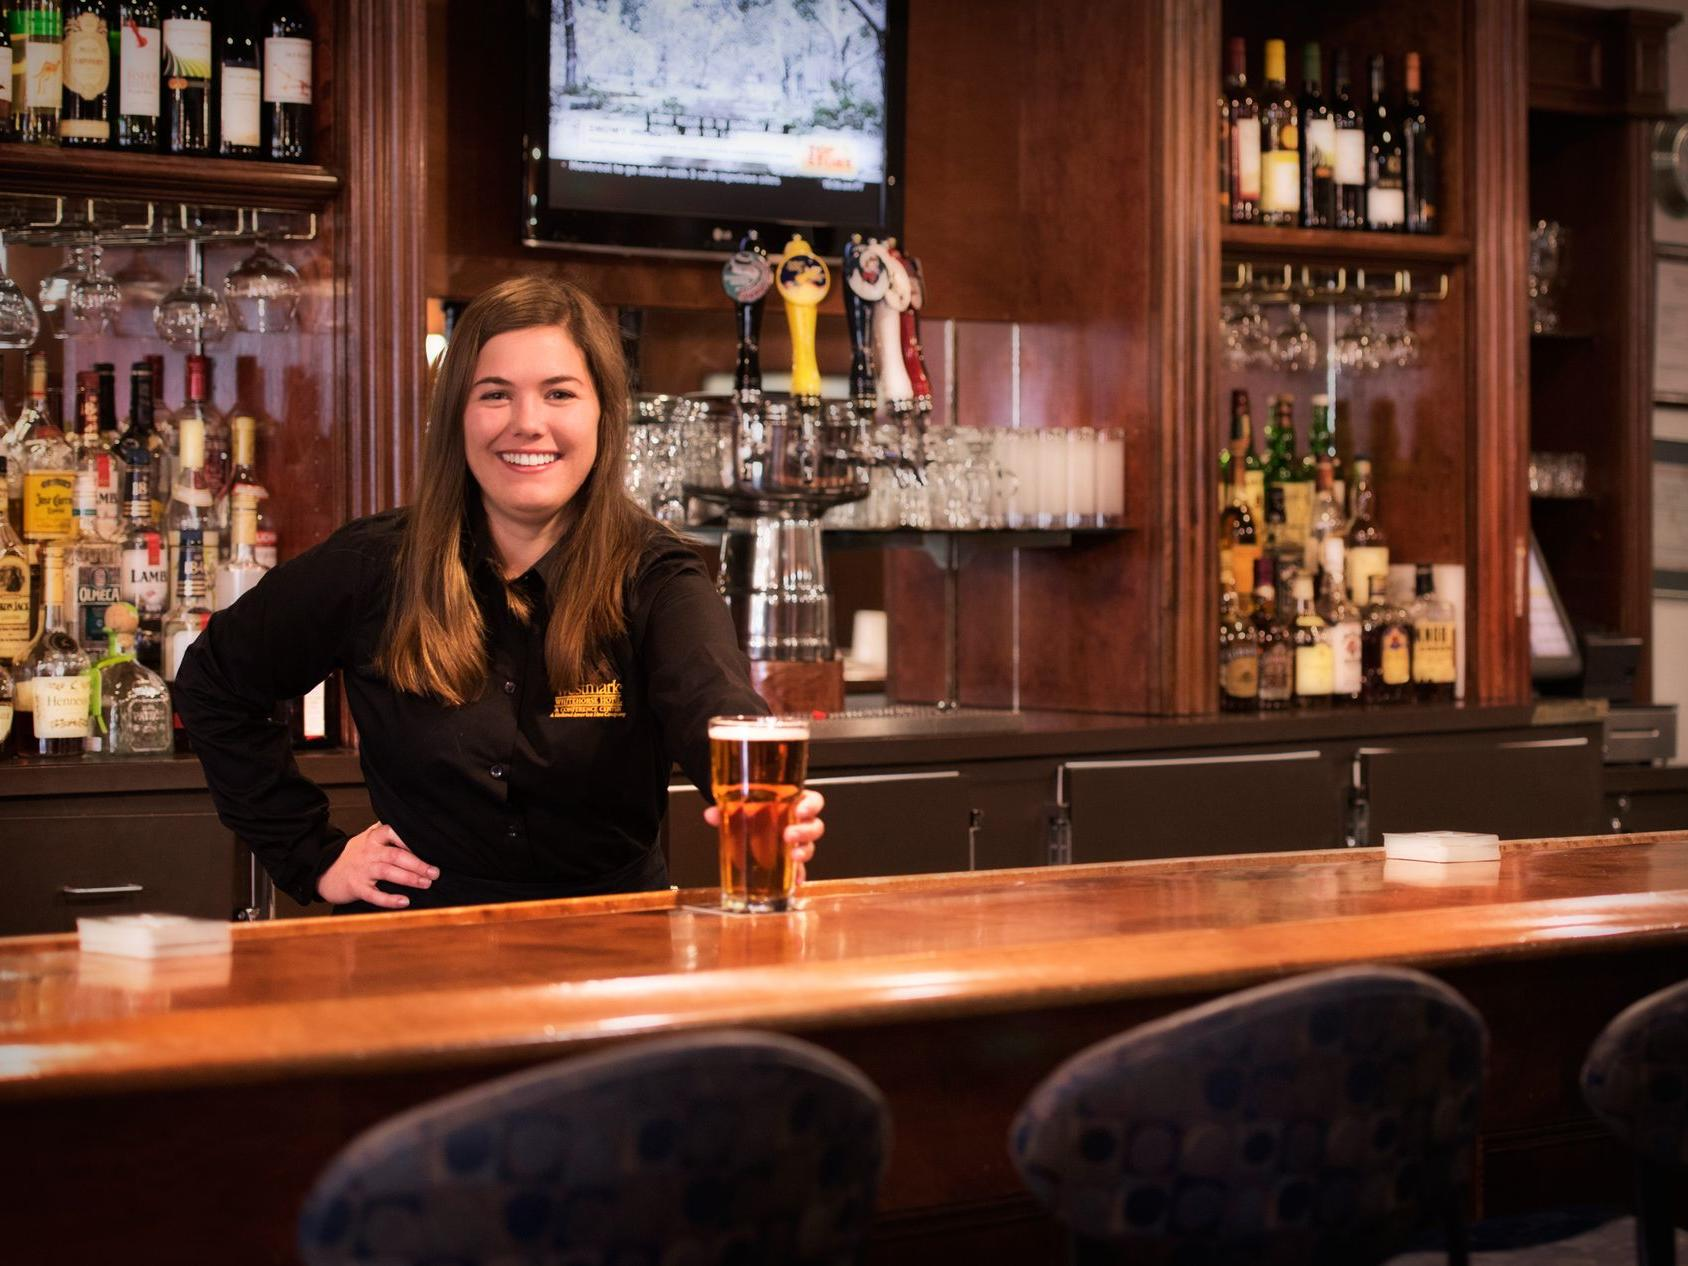 Bartender serving beer at Steele Street Lounge